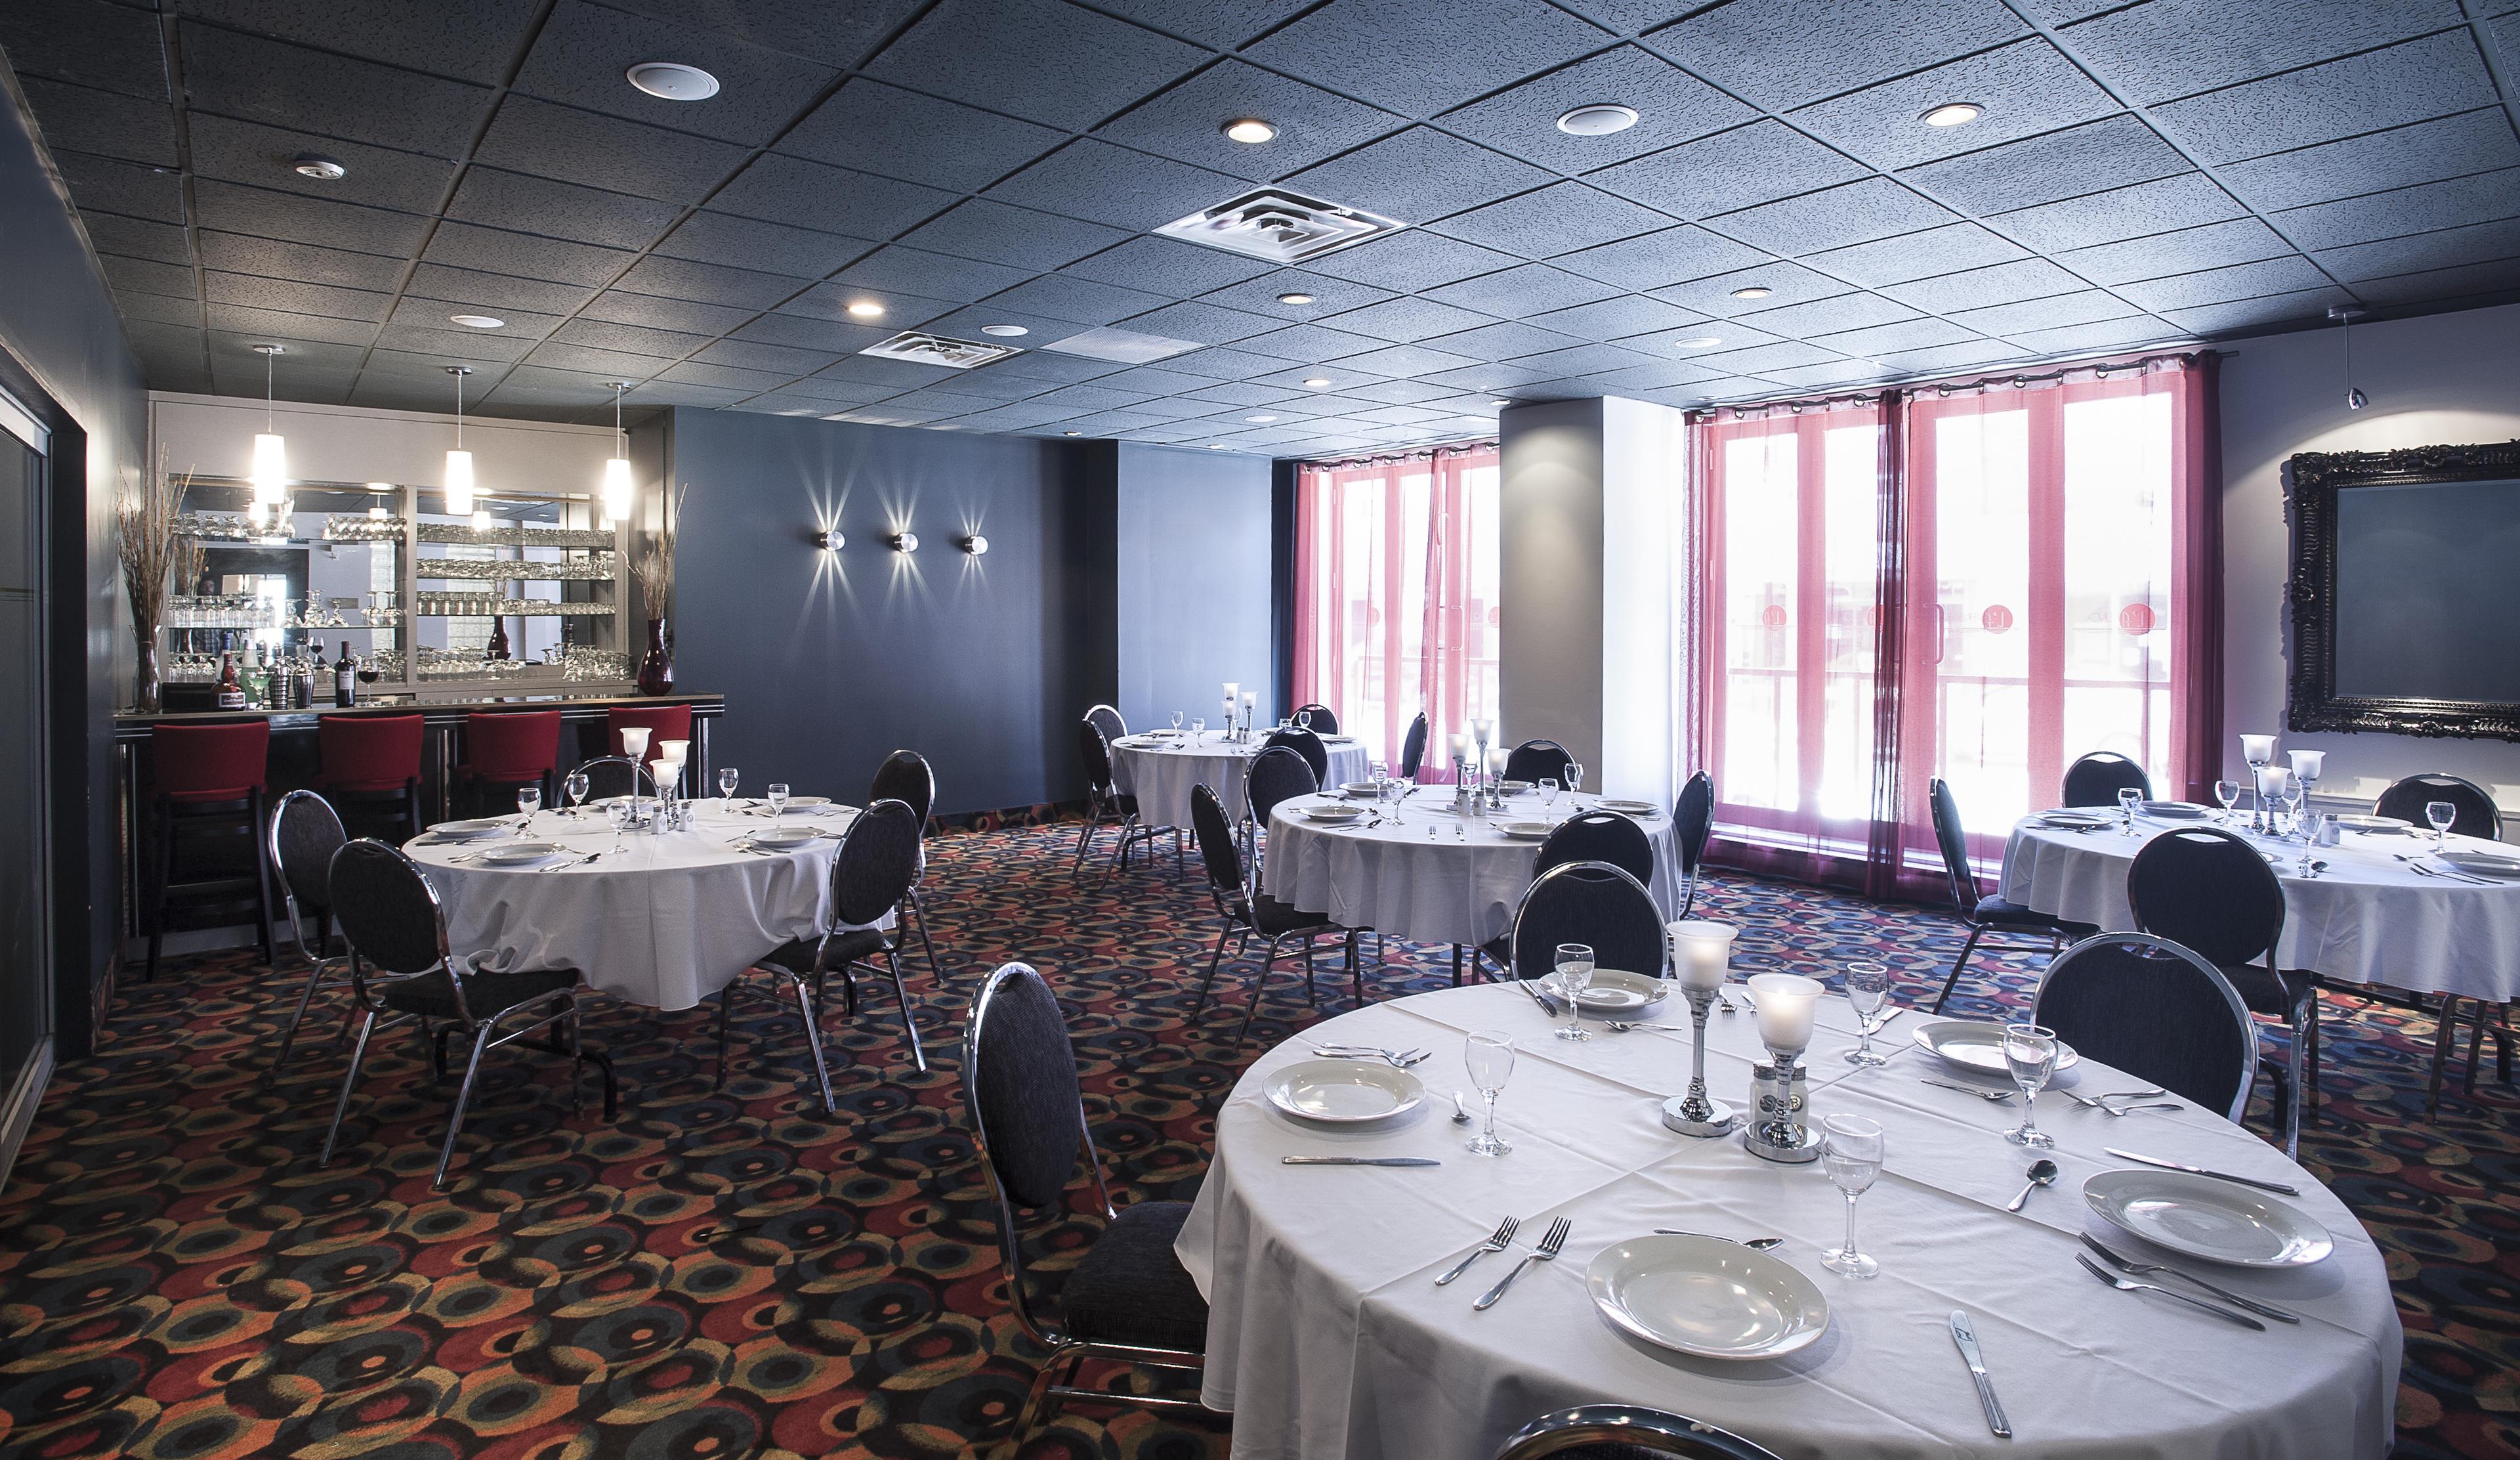 Best Western Plus Hotel Albert Rouyn-Noranda à Rouyn-Noranda: Conference Room